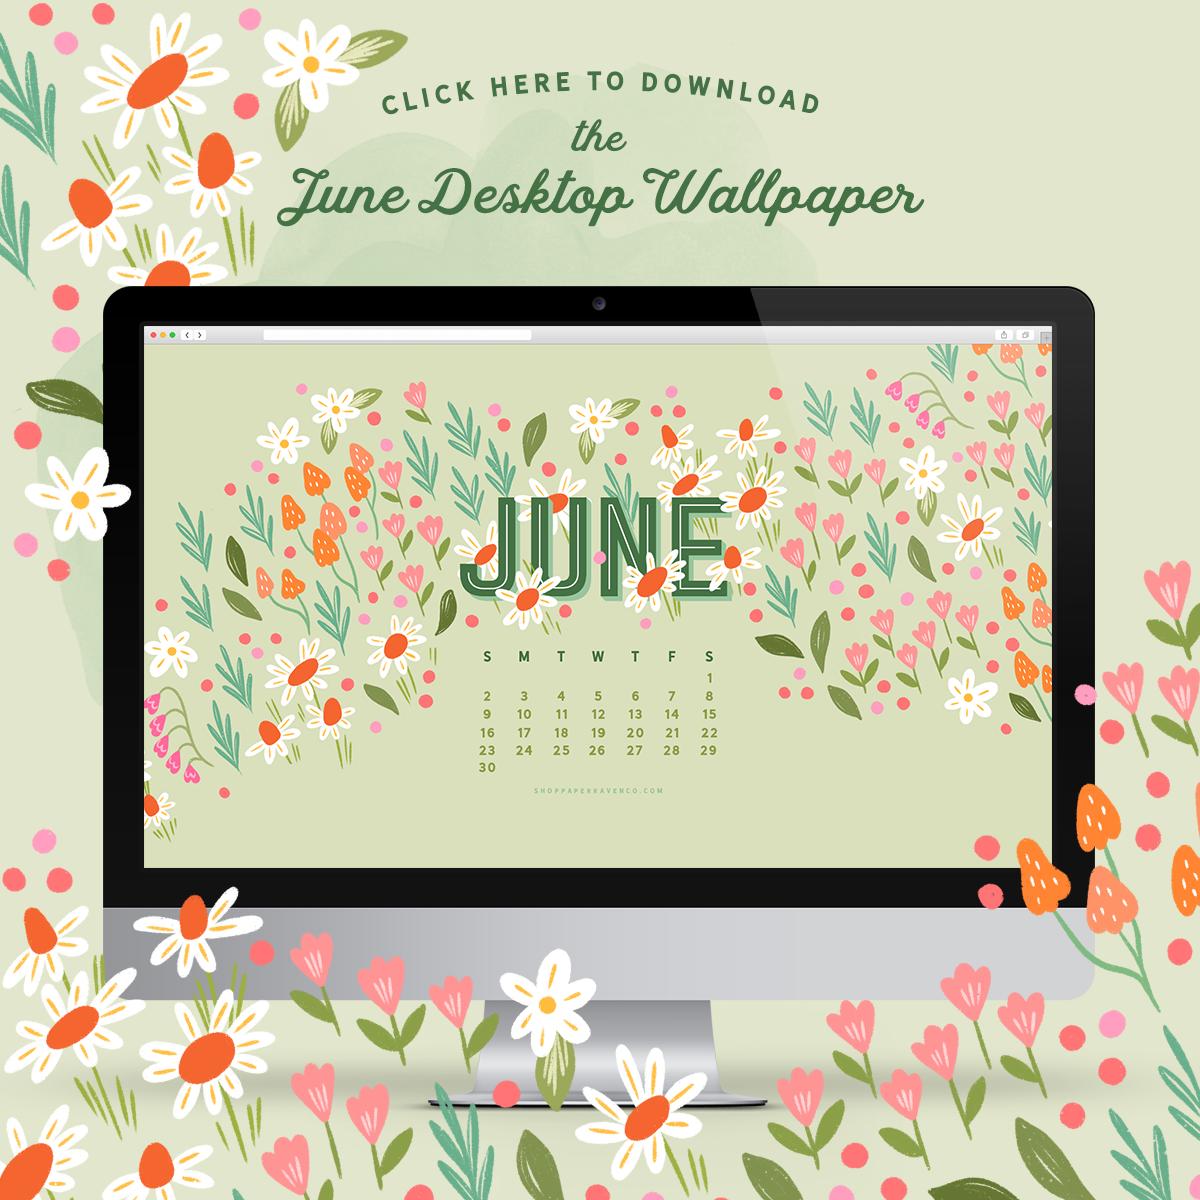 June 2019 Illustrated Desktop Wallpaper by Paper Raven Co.  - www.ShopPaperRavenCo.com #dressyourtech #desktopwallpaper #desktopcalendar